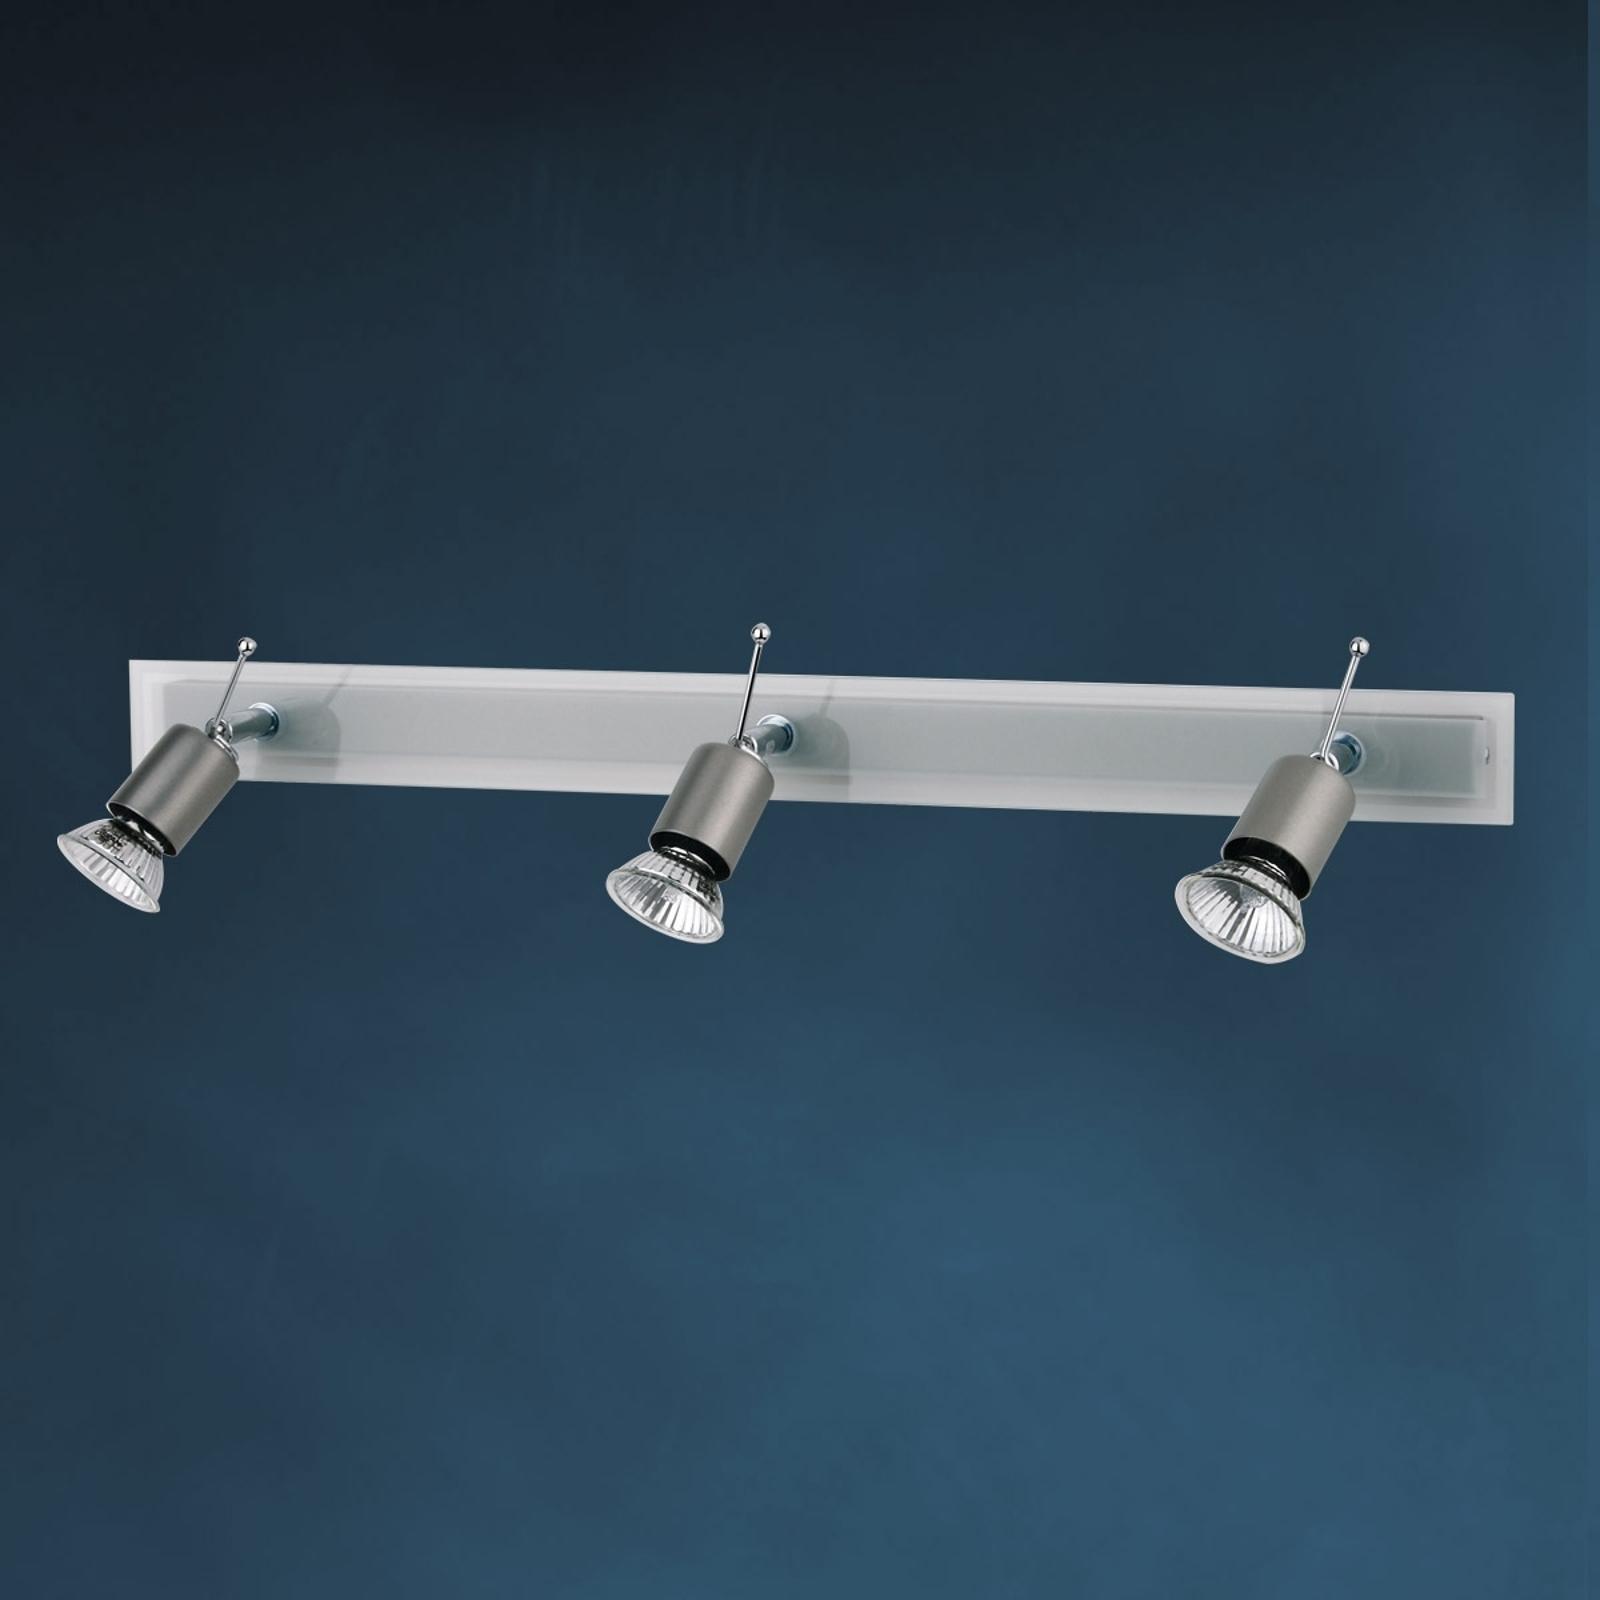 Fraaie plafondlamp SARA met glasplaat 3-lichts